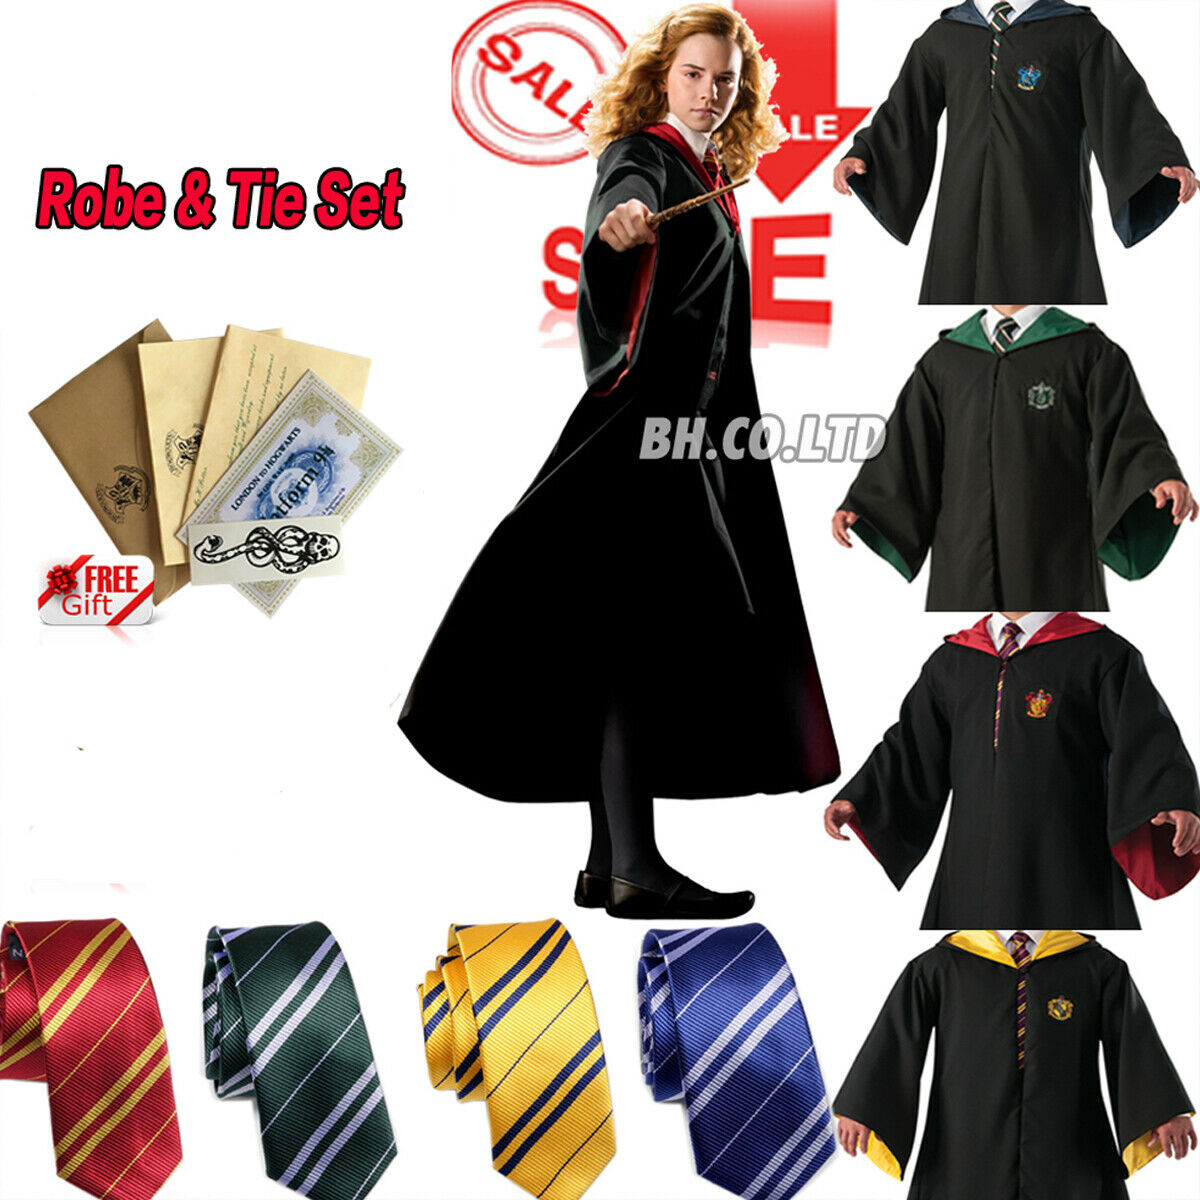 Harry Potter Robe+Schal+Krawatte Uniform Komplett Karneval kostüm Cosplay DE